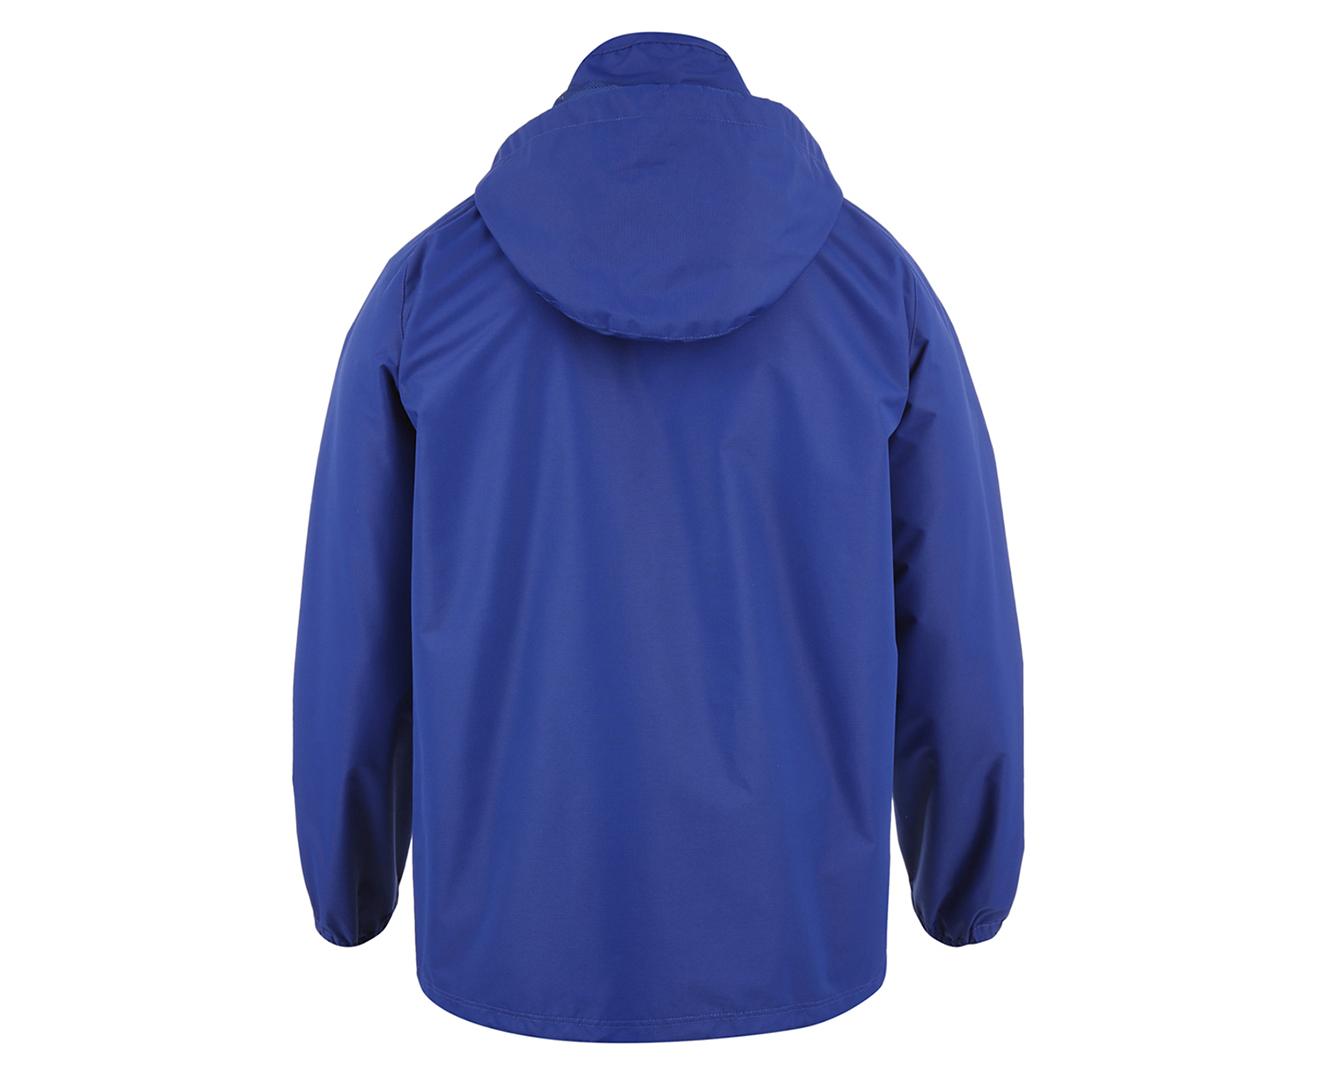 1047b573 Details about Canterbury Men's Team Full Zip Rain Jacket - Royal Blue